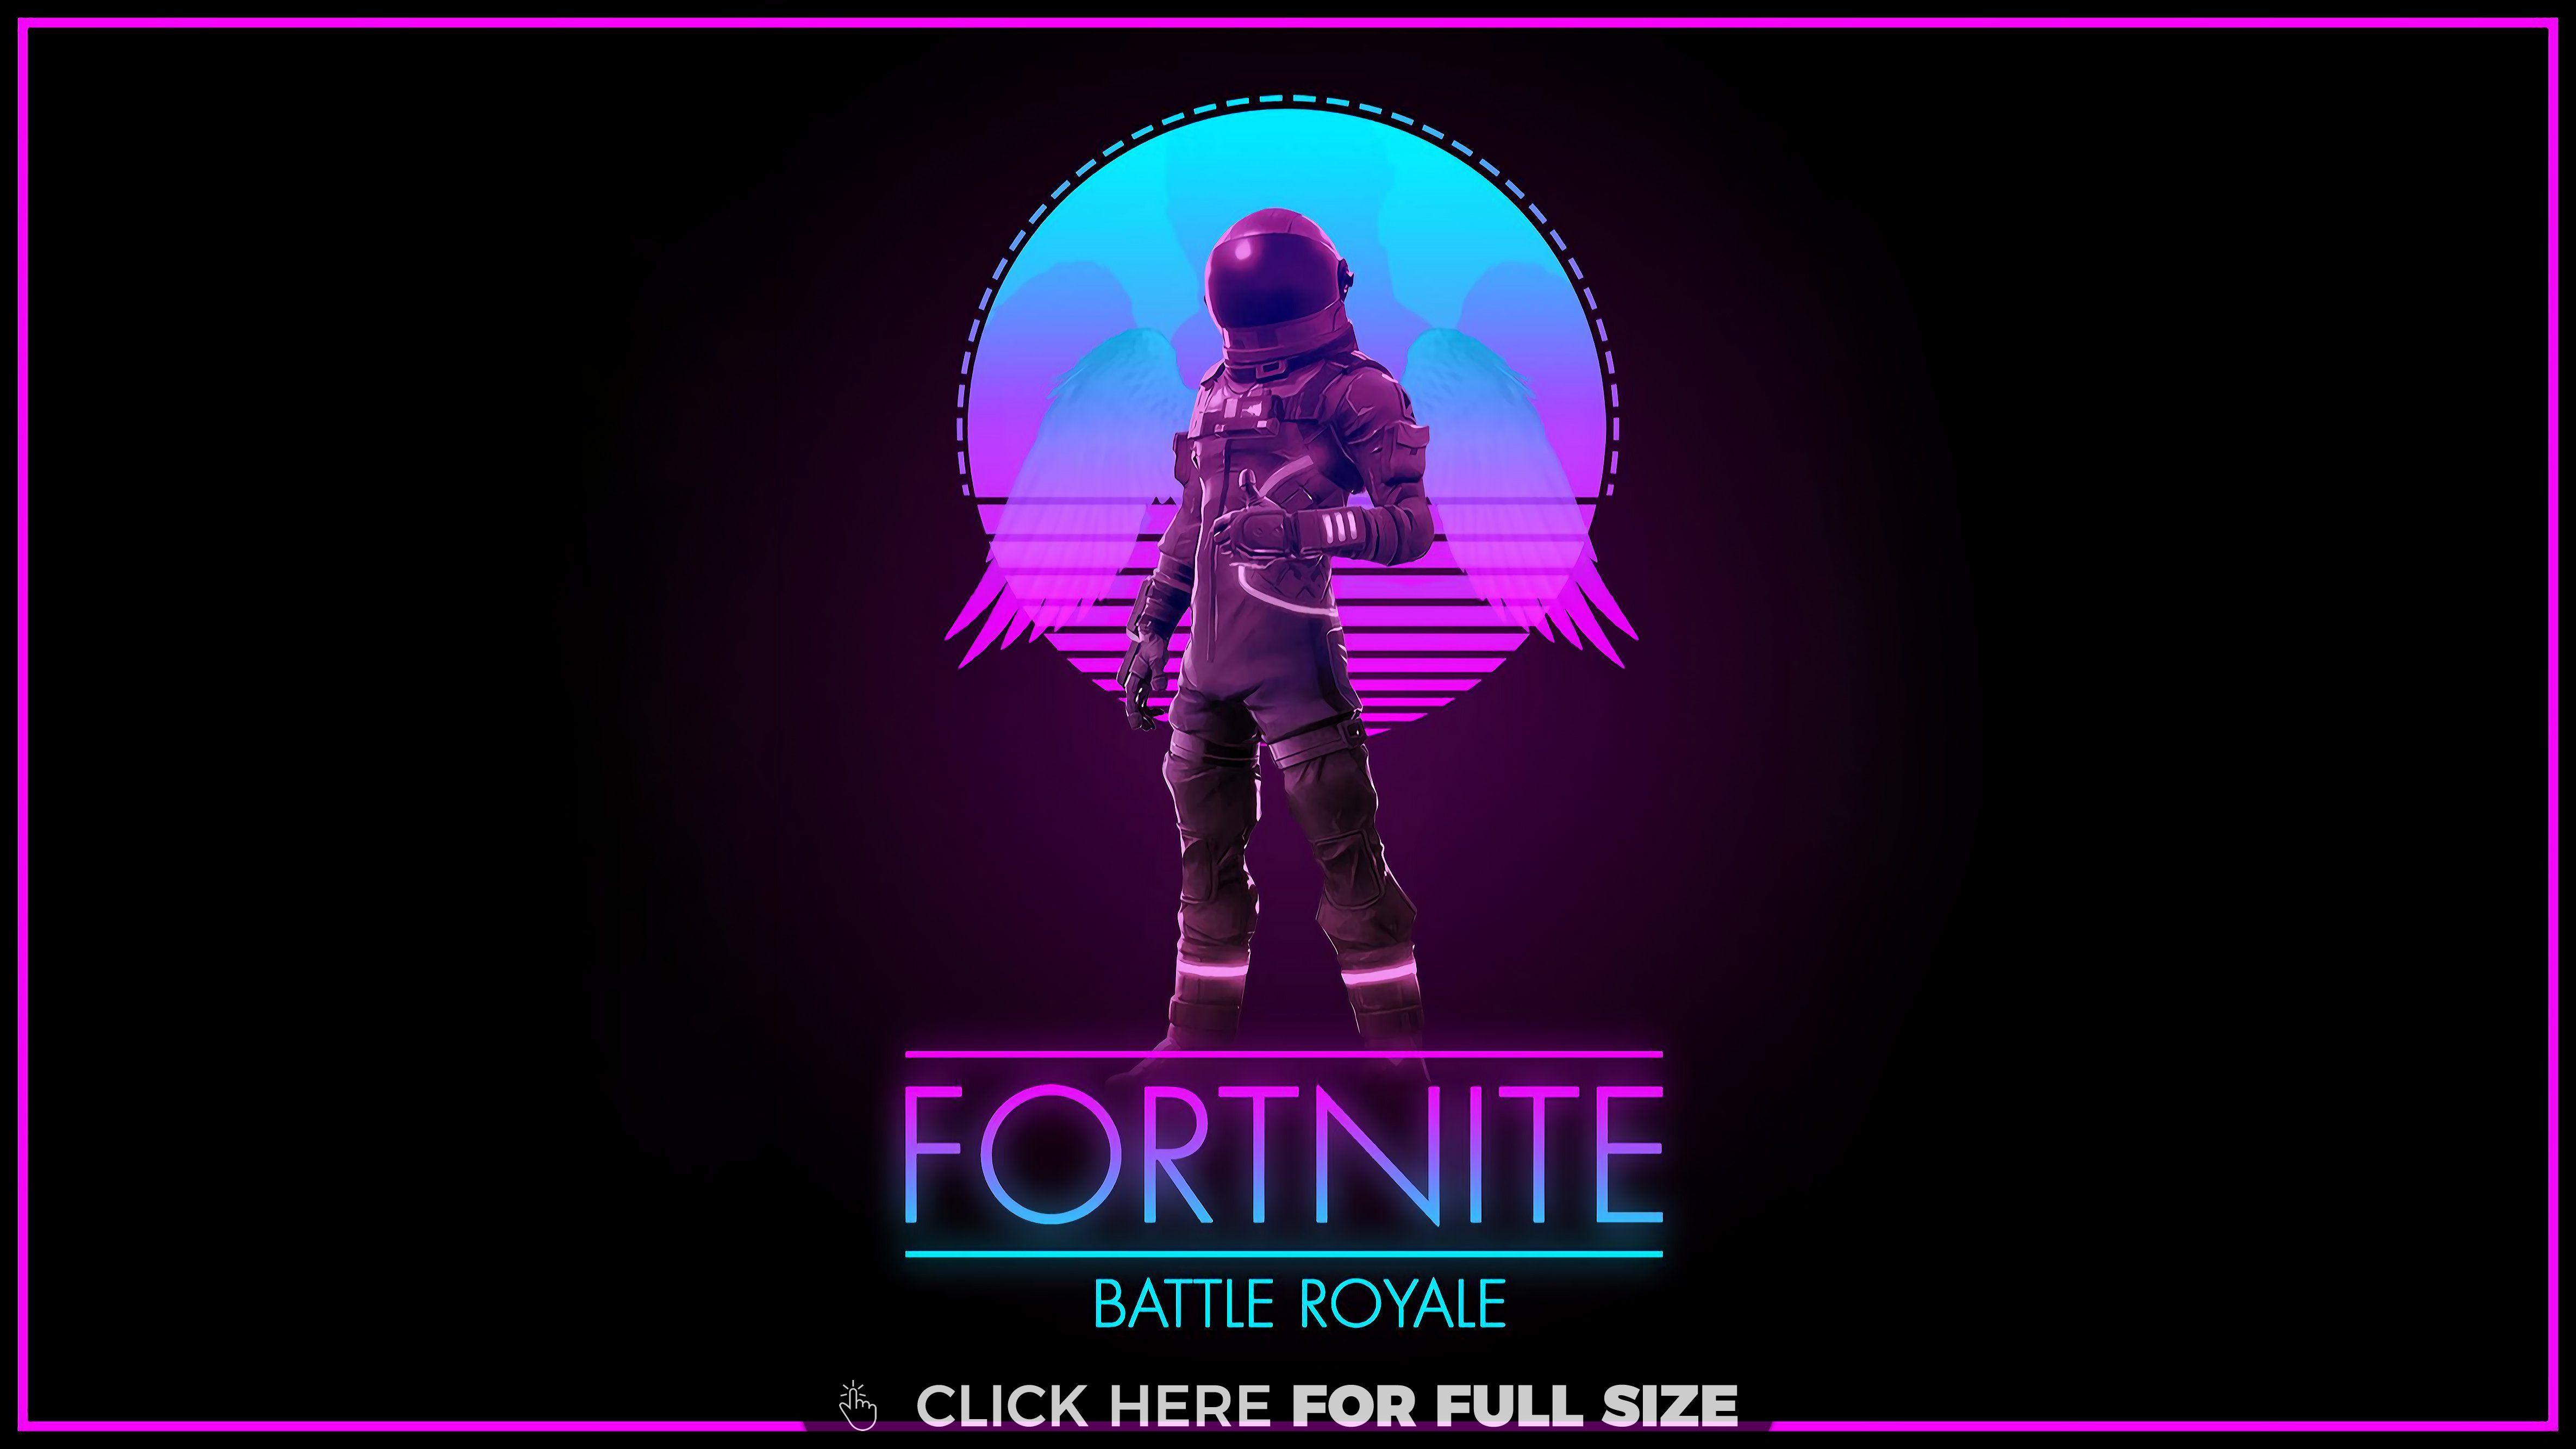 Fortnite Synthwave Royale Desktop Wallpapers Pinterest